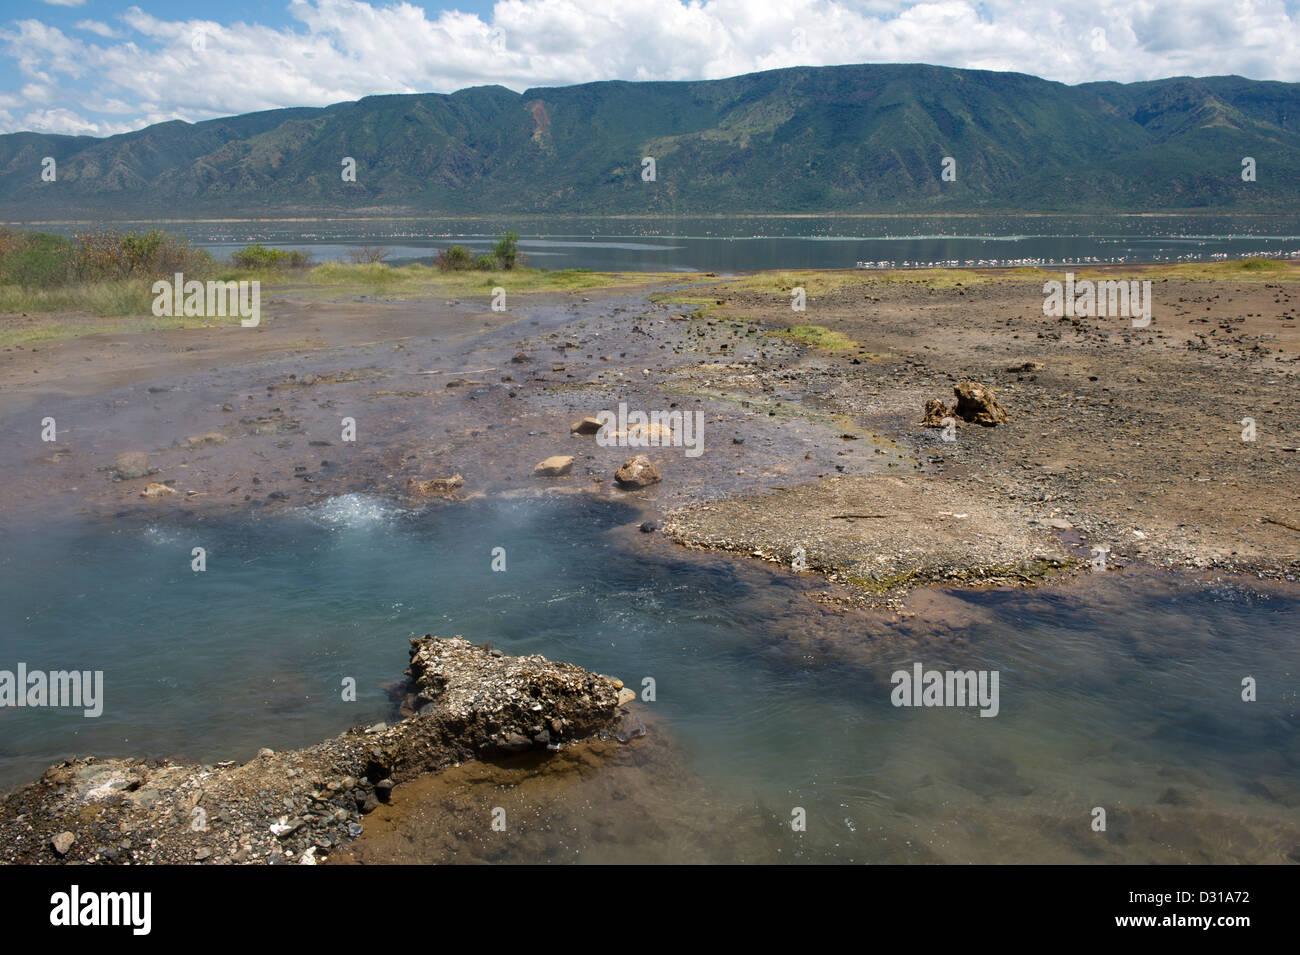 Hot springs, Lake Bogoria National Reserve, Rift Valley, Kenya Stock Photo